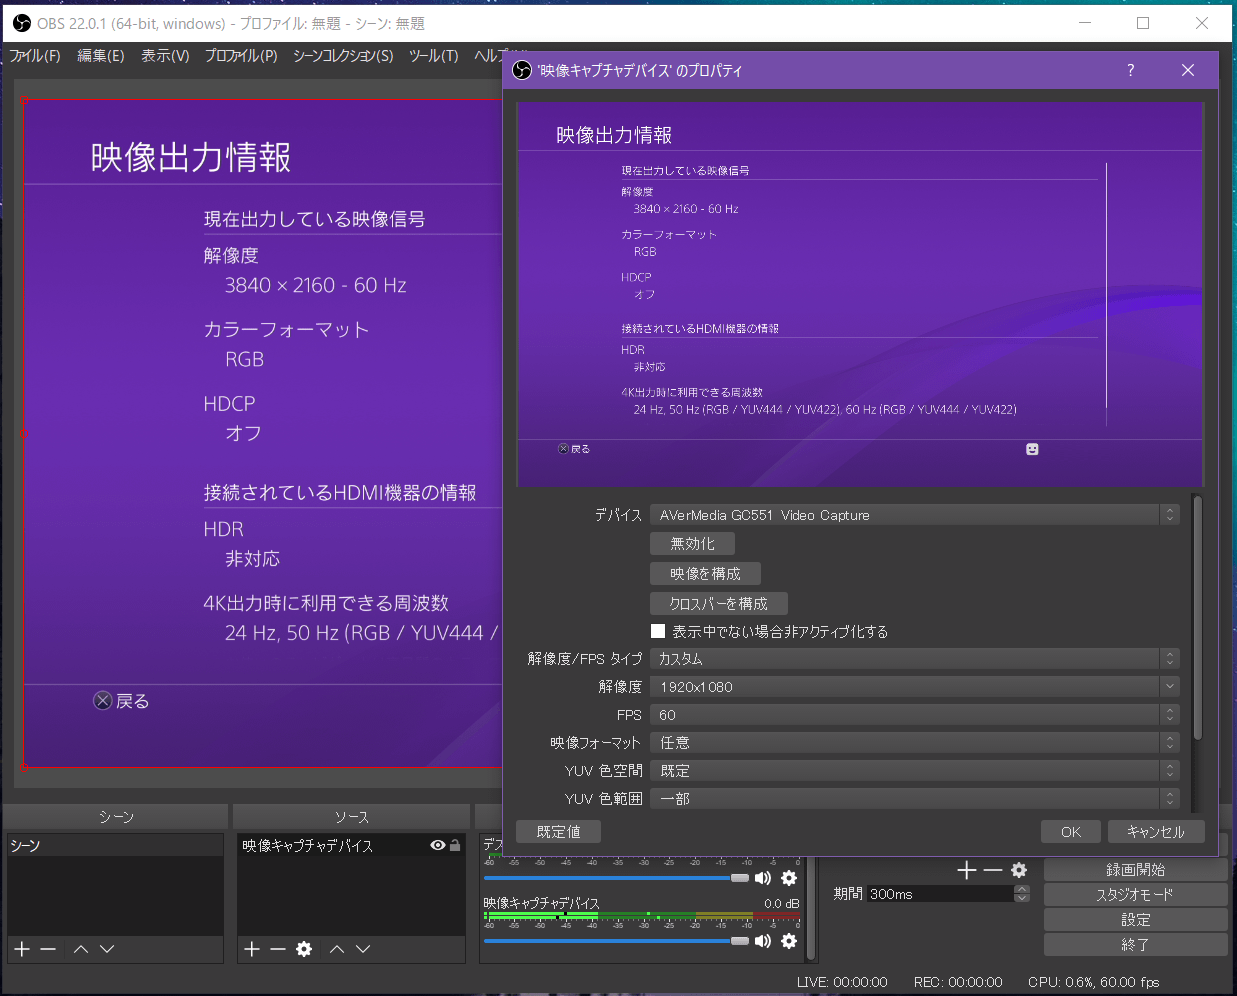 AVerMedia Live Gamer EXTREME 2 PLUS_OBS